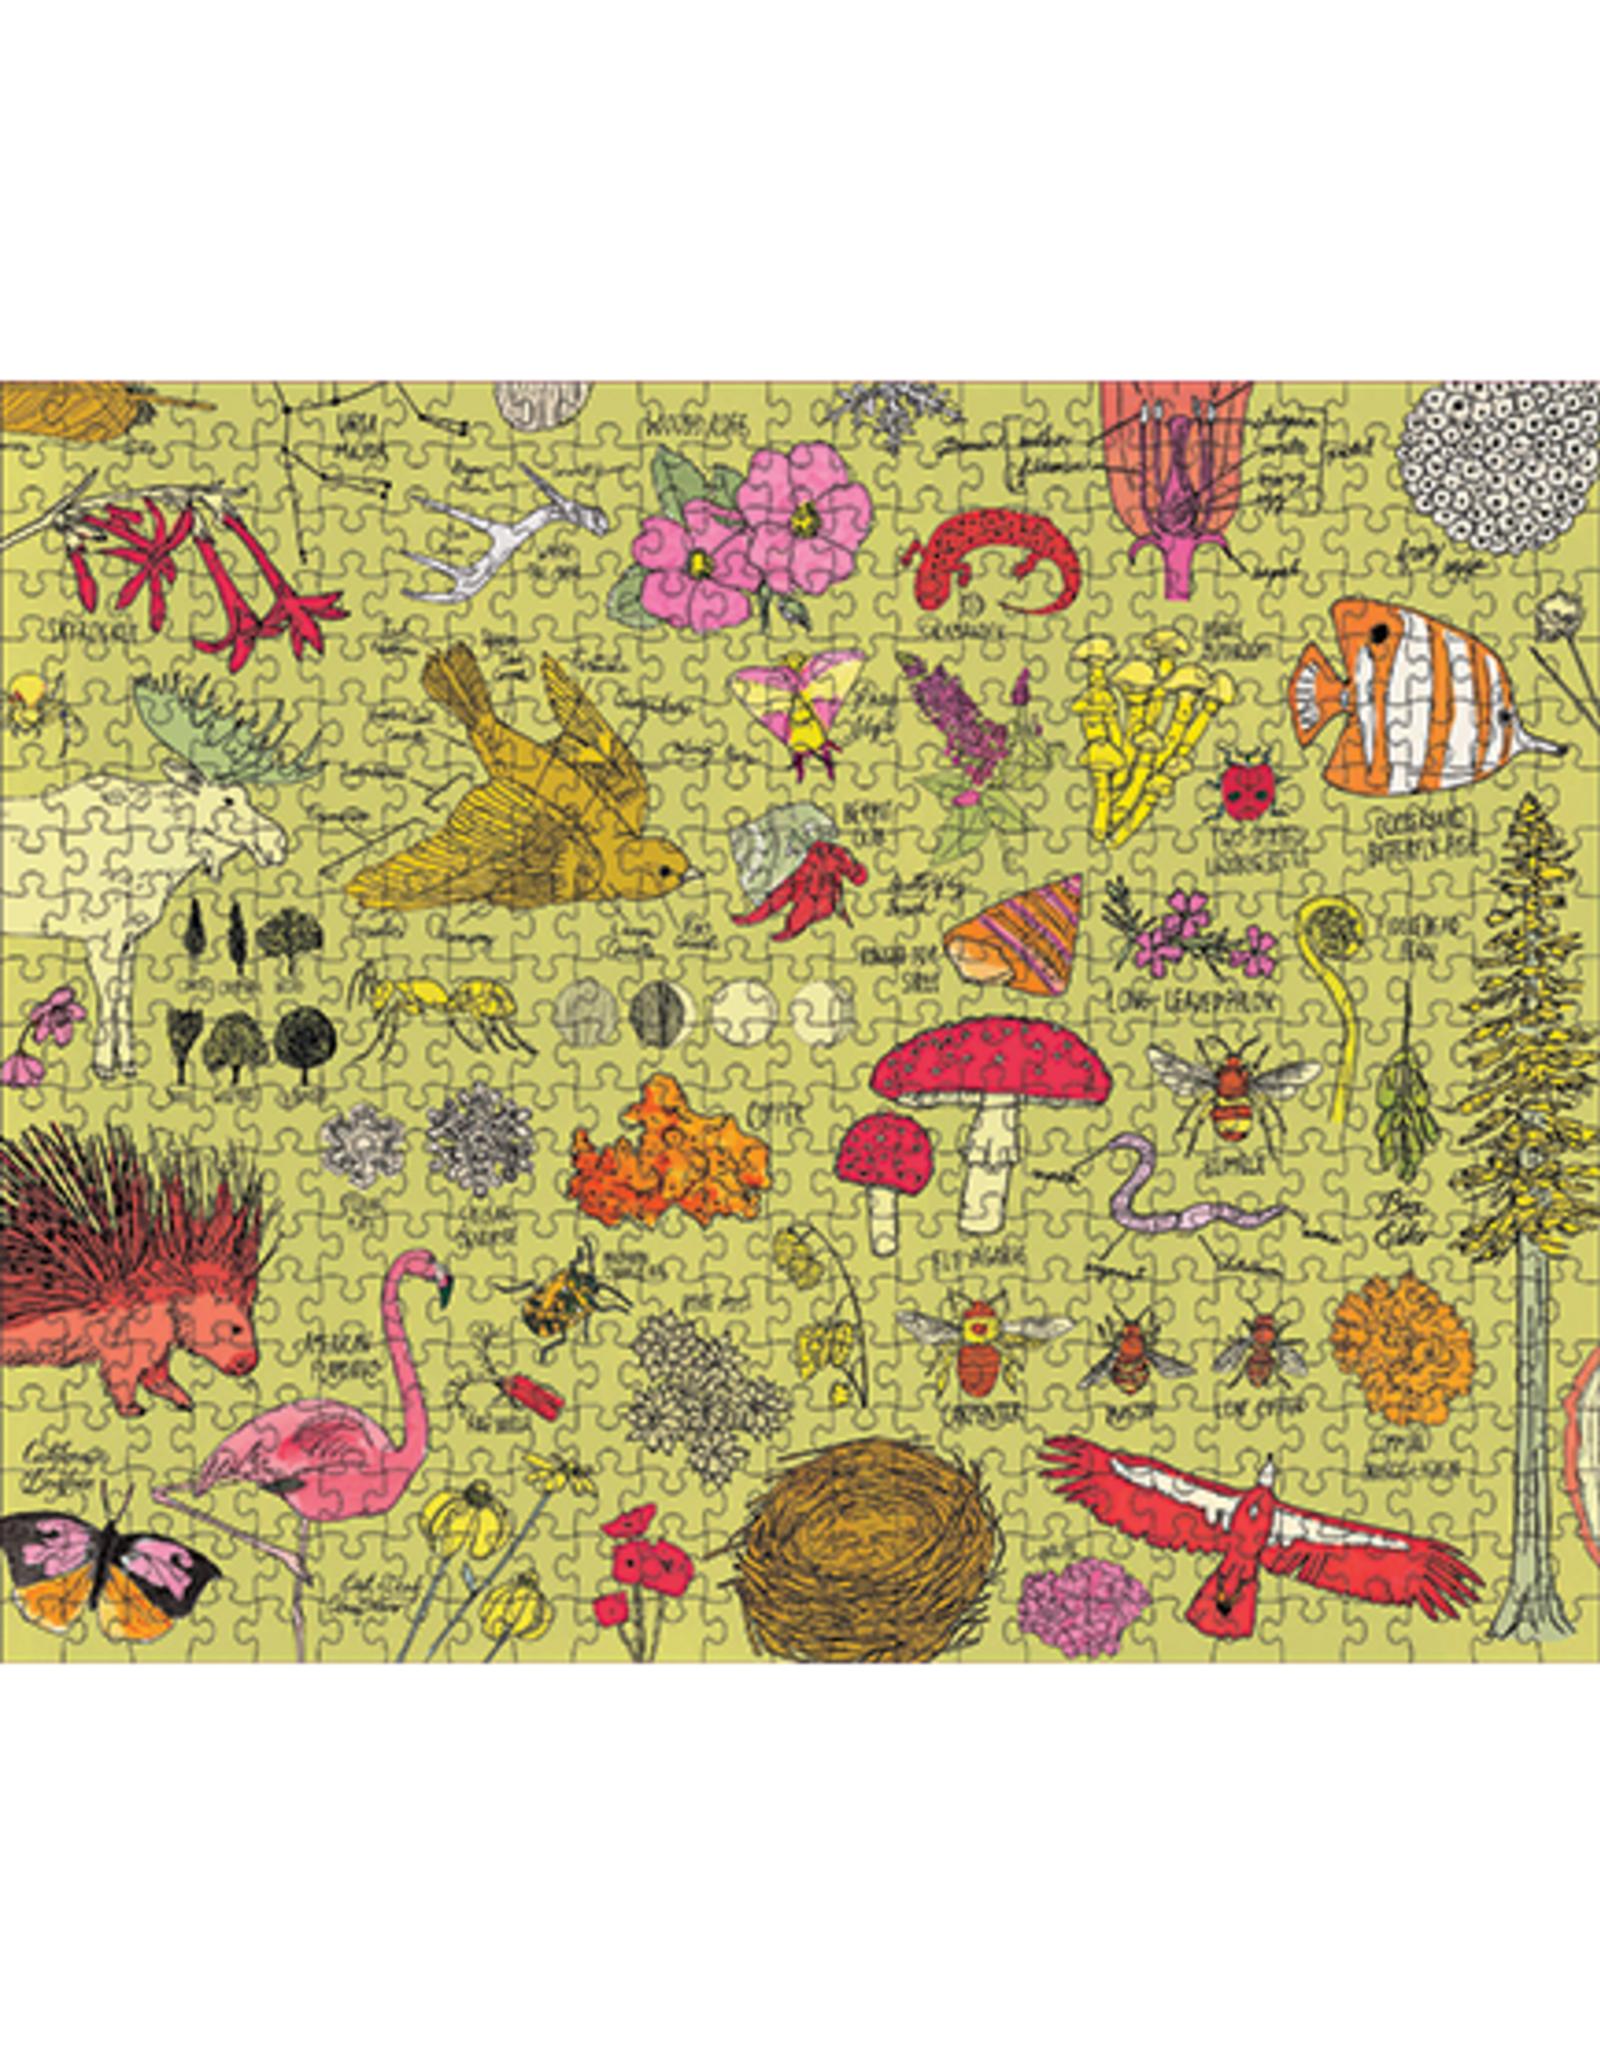 Nature Anatomy: 500 Piece Puzzle